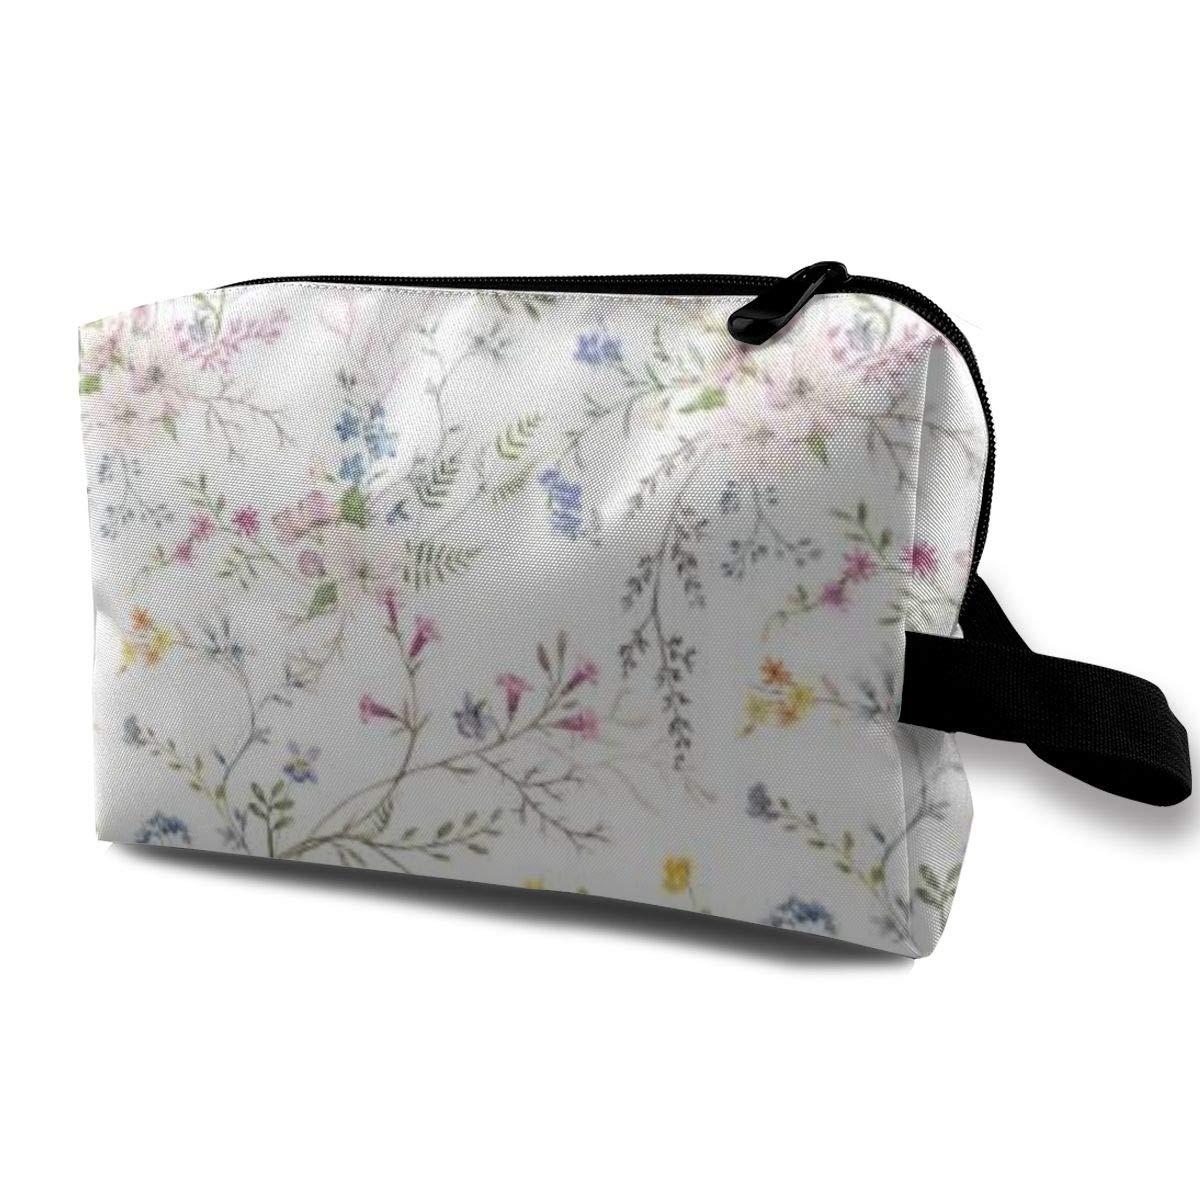 Makeup Bag Cosmetic Pouch Watercolor Floral Pattern Multi-Functional Bag Travel Kit Storage Bag